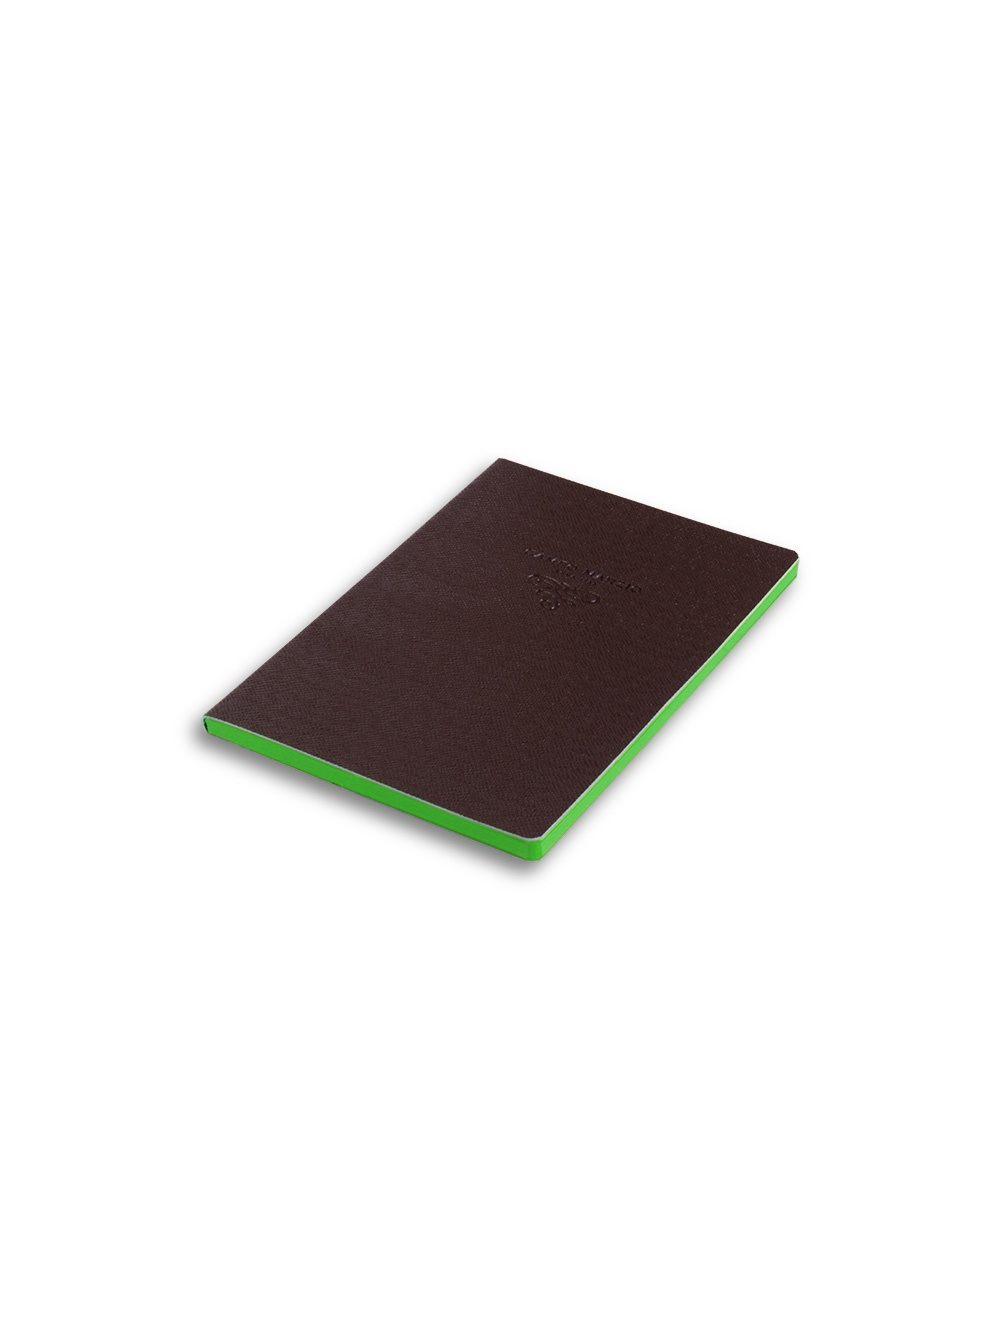 Journal 16,5 X 23,4 Cm - Coloured Internal Paper  - Brown